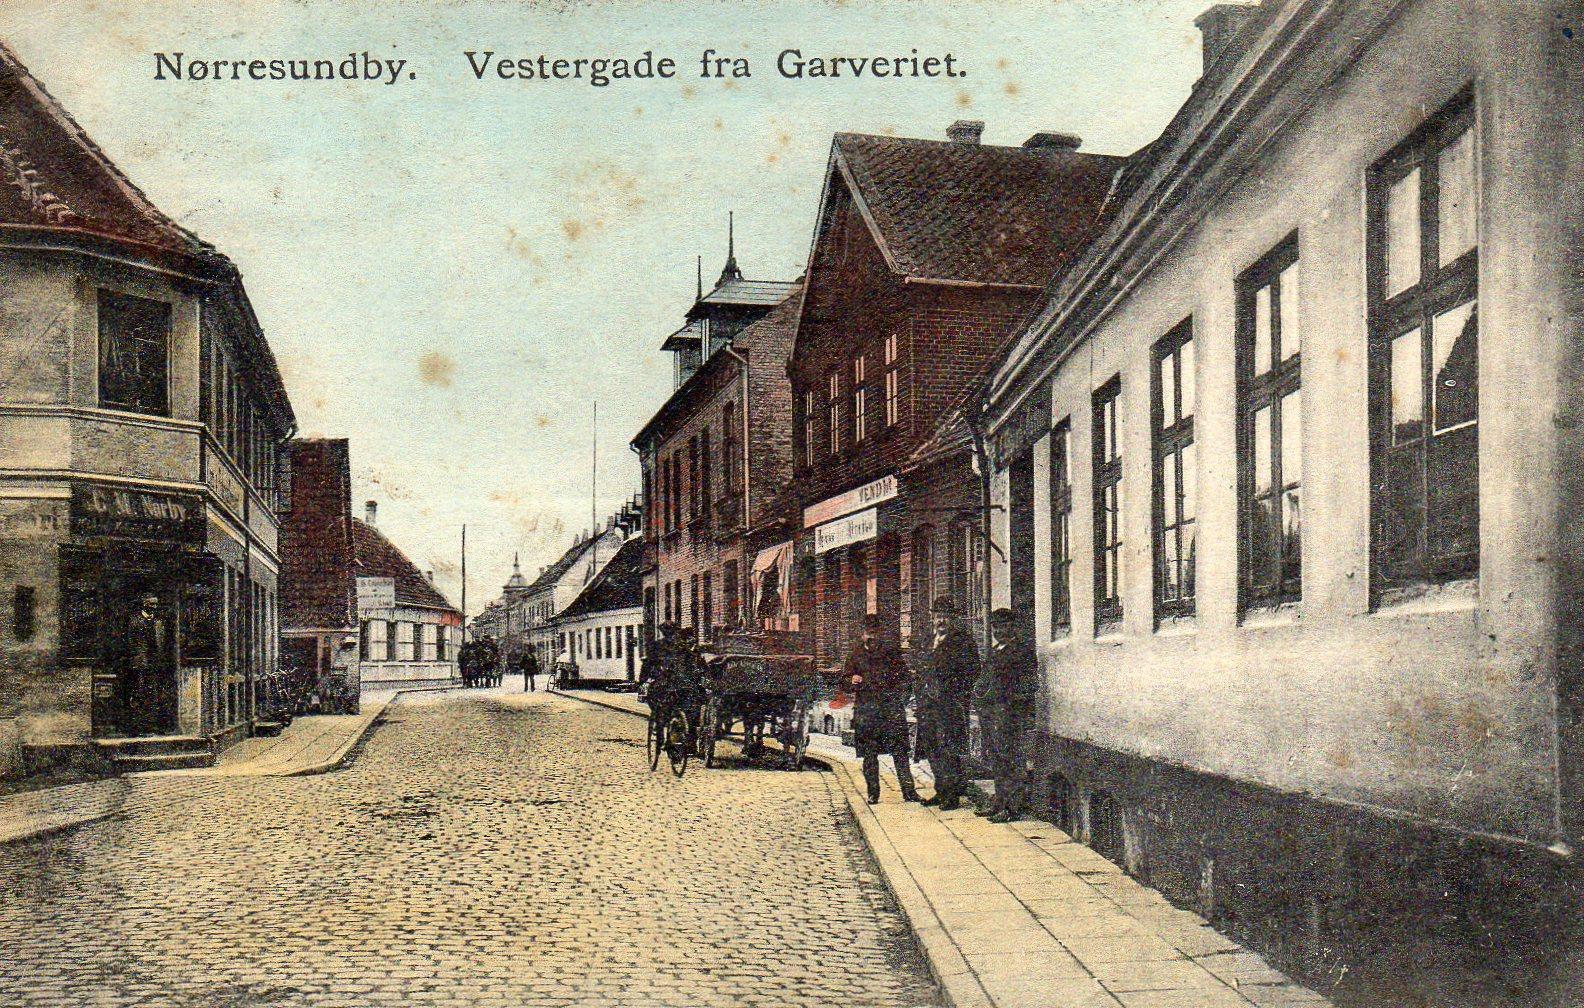 Nørresundby Vestergade